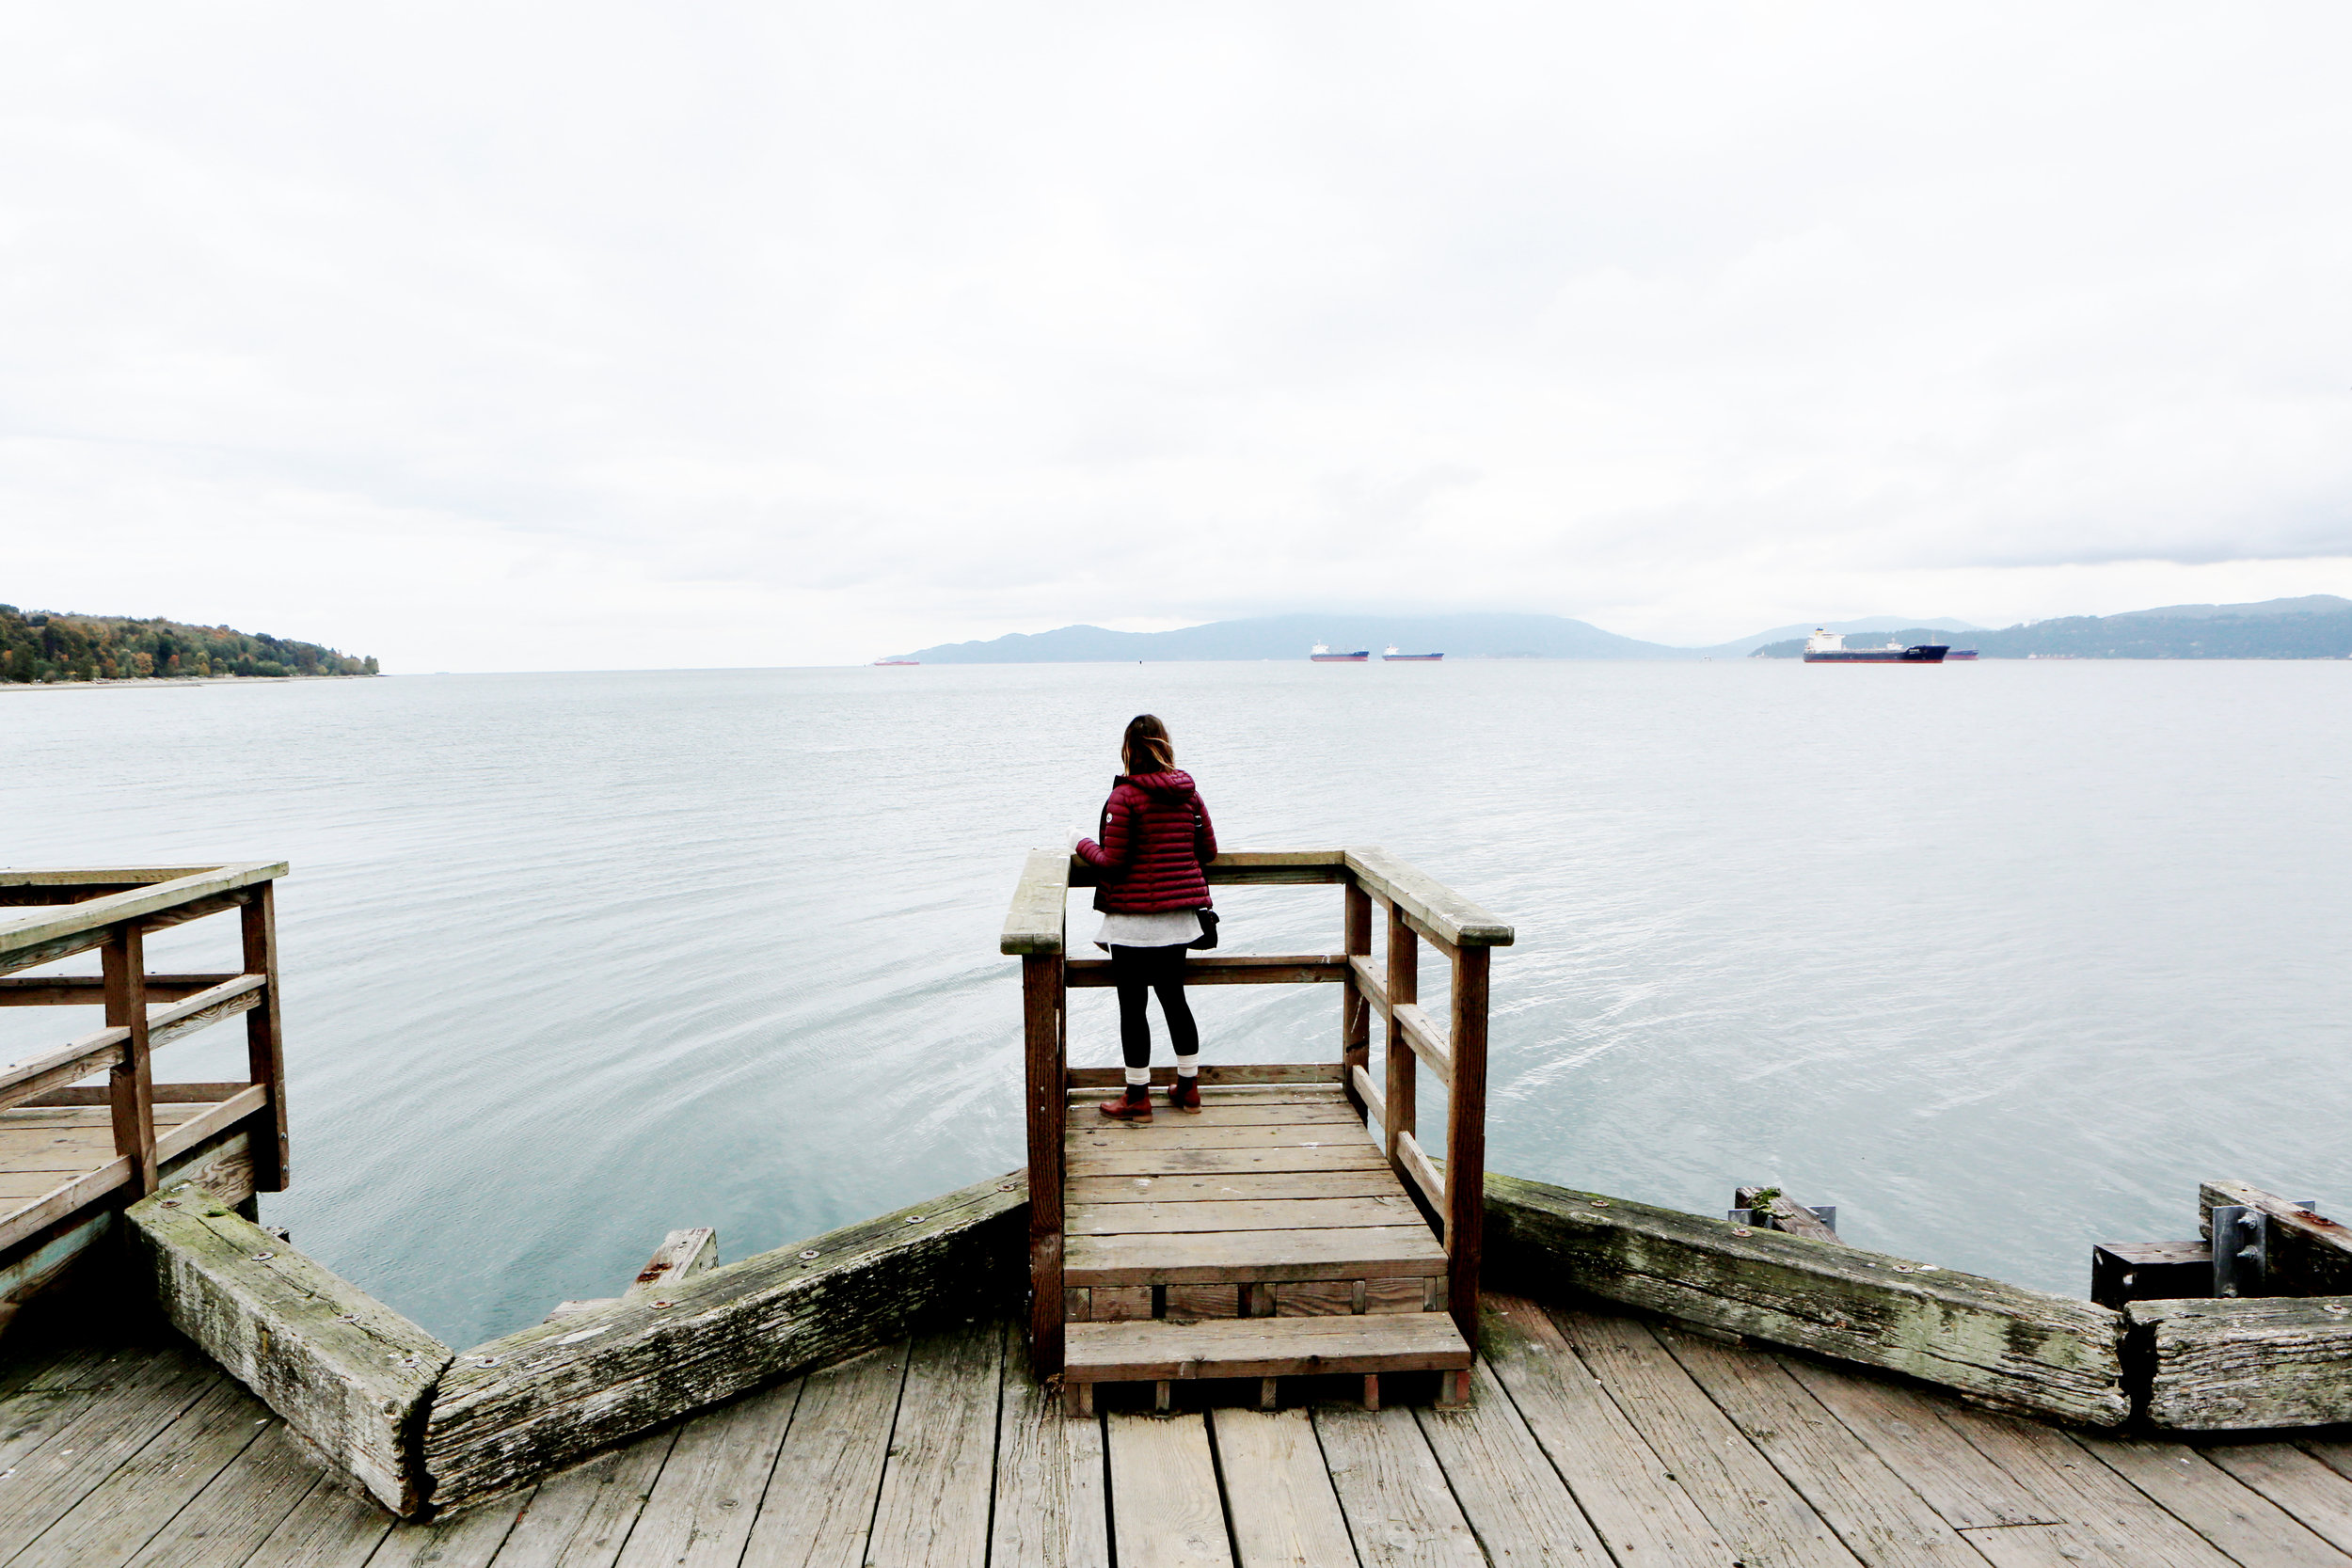 2016-10-Life-of-Pix-free-stock-woman-jetty-sea-LEEROY.jpg